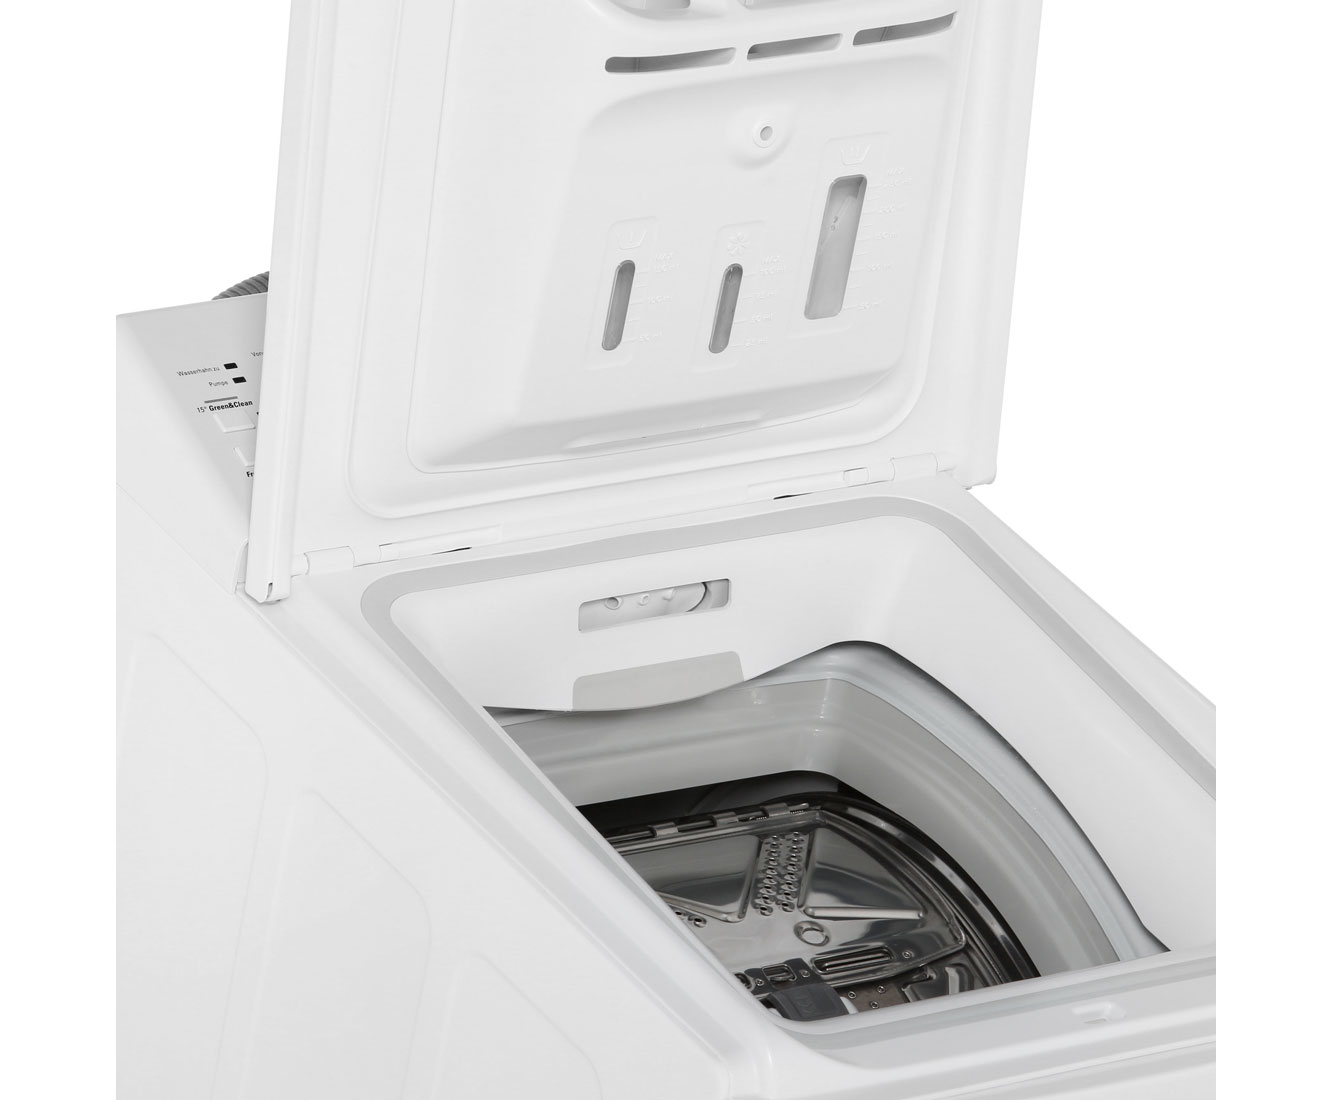 Bauknecht wat prime 652 di waschmaschine toplader 6 kg 1200 u min a